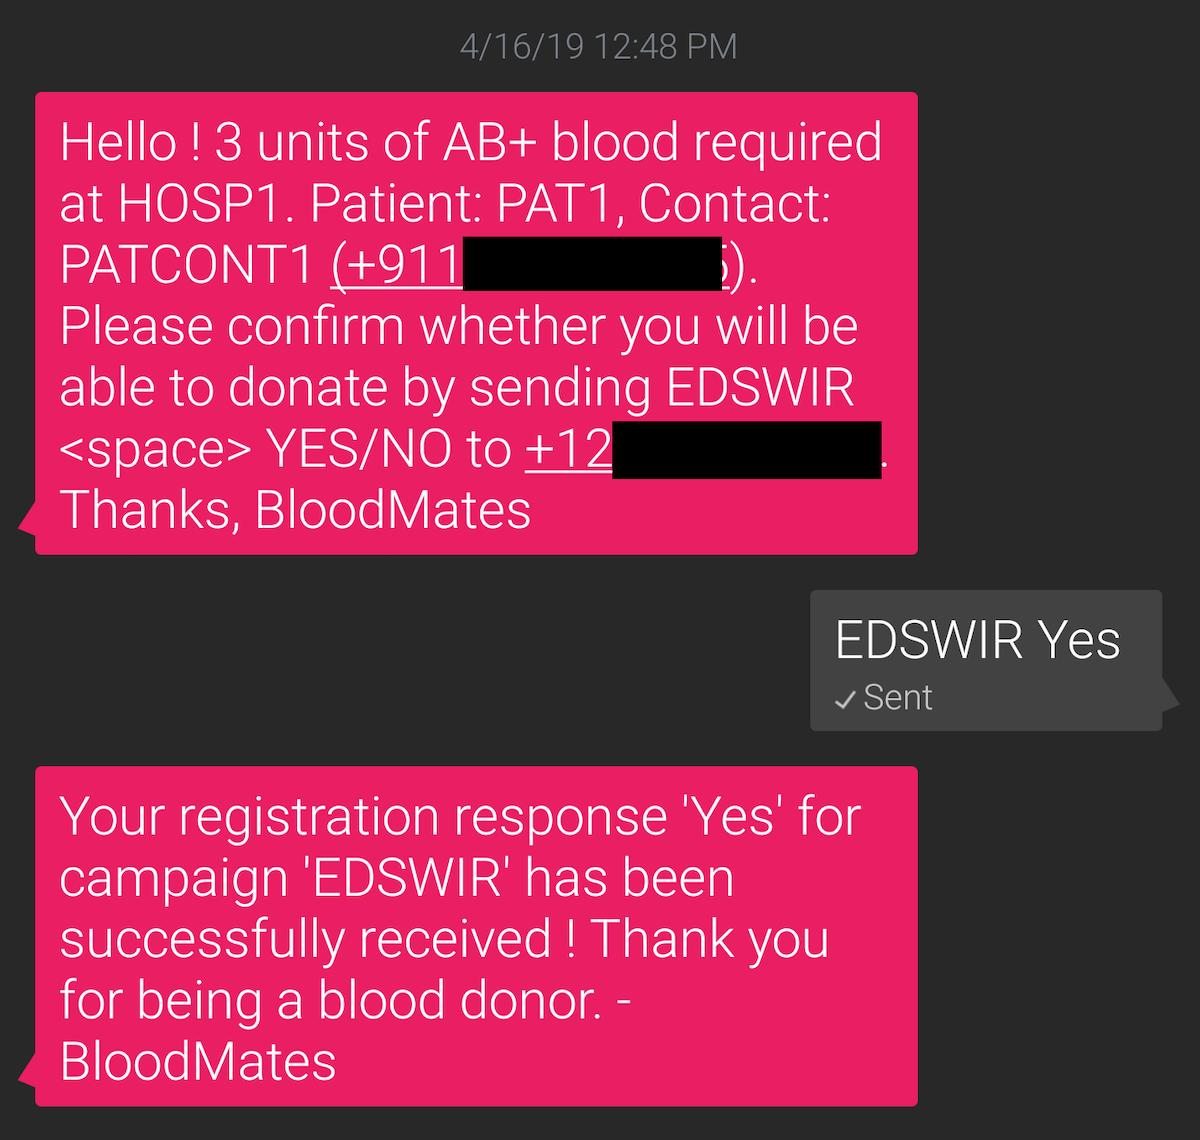 Send and receive responses via SMS using Messagebird and